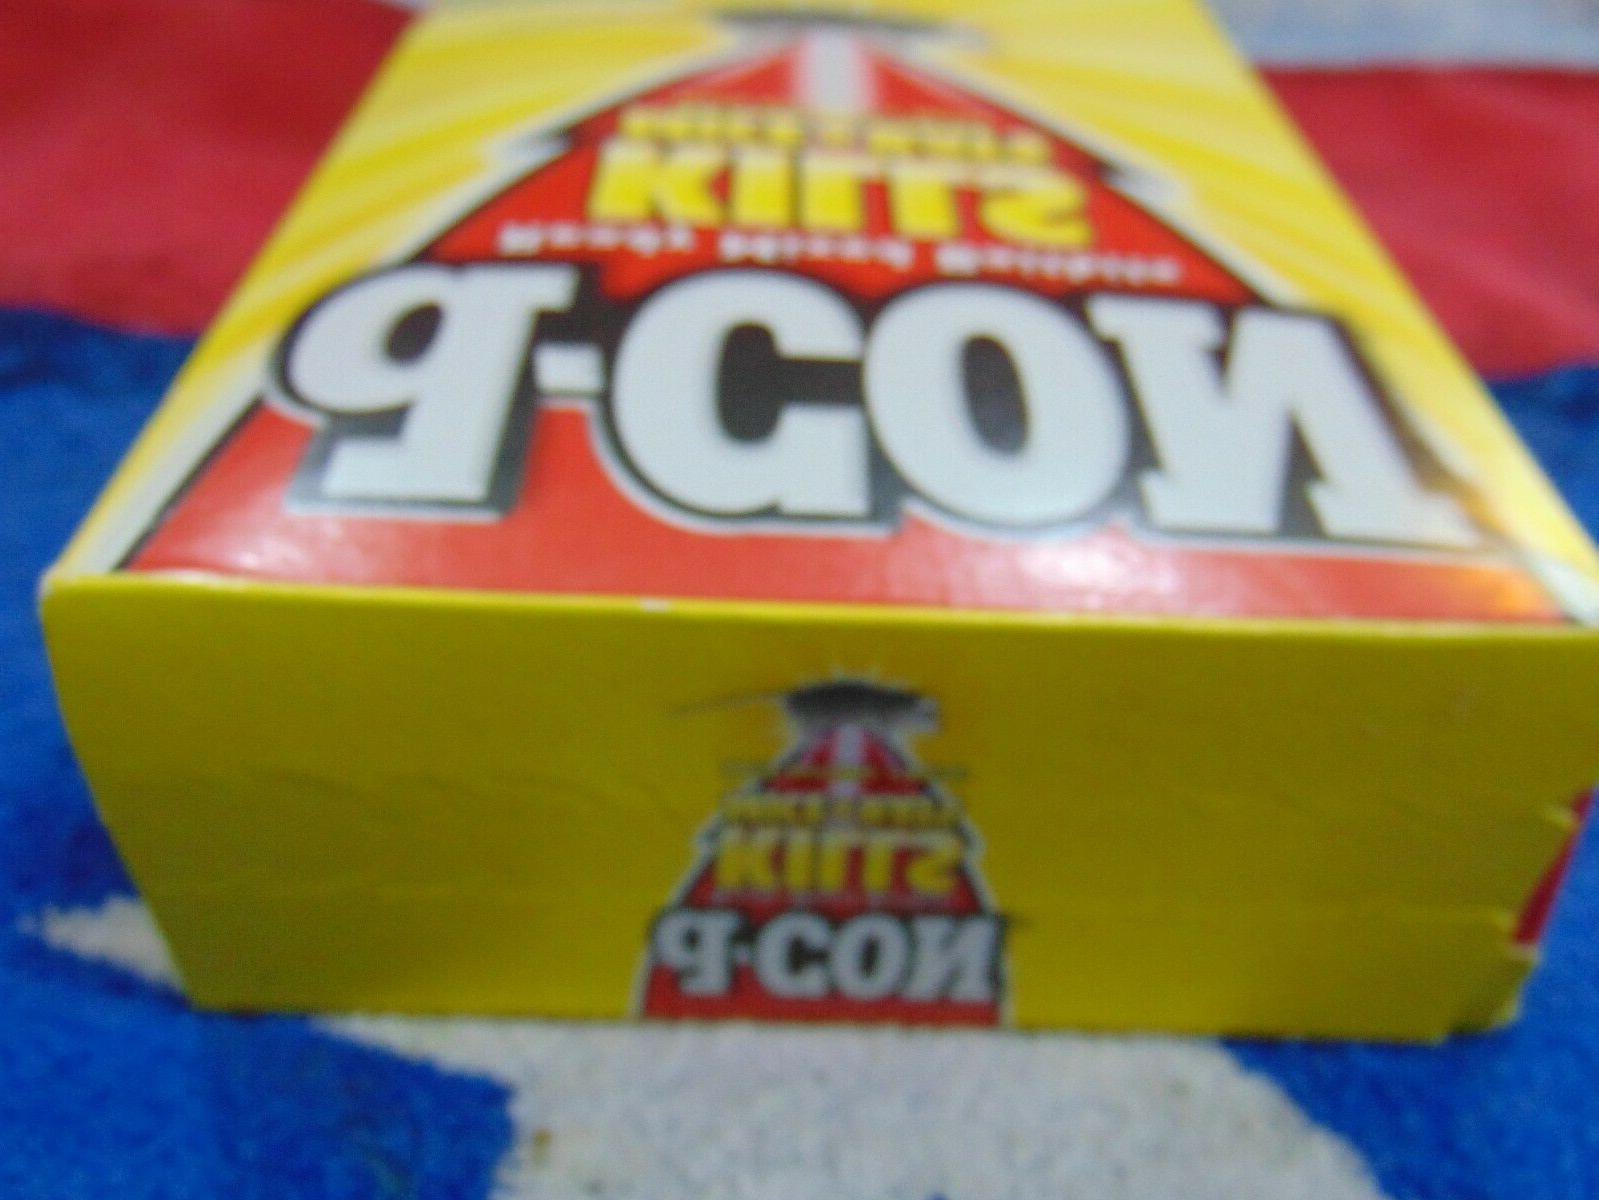 NIB Baitbits Mice Pellets / POISON, 4-3 THE